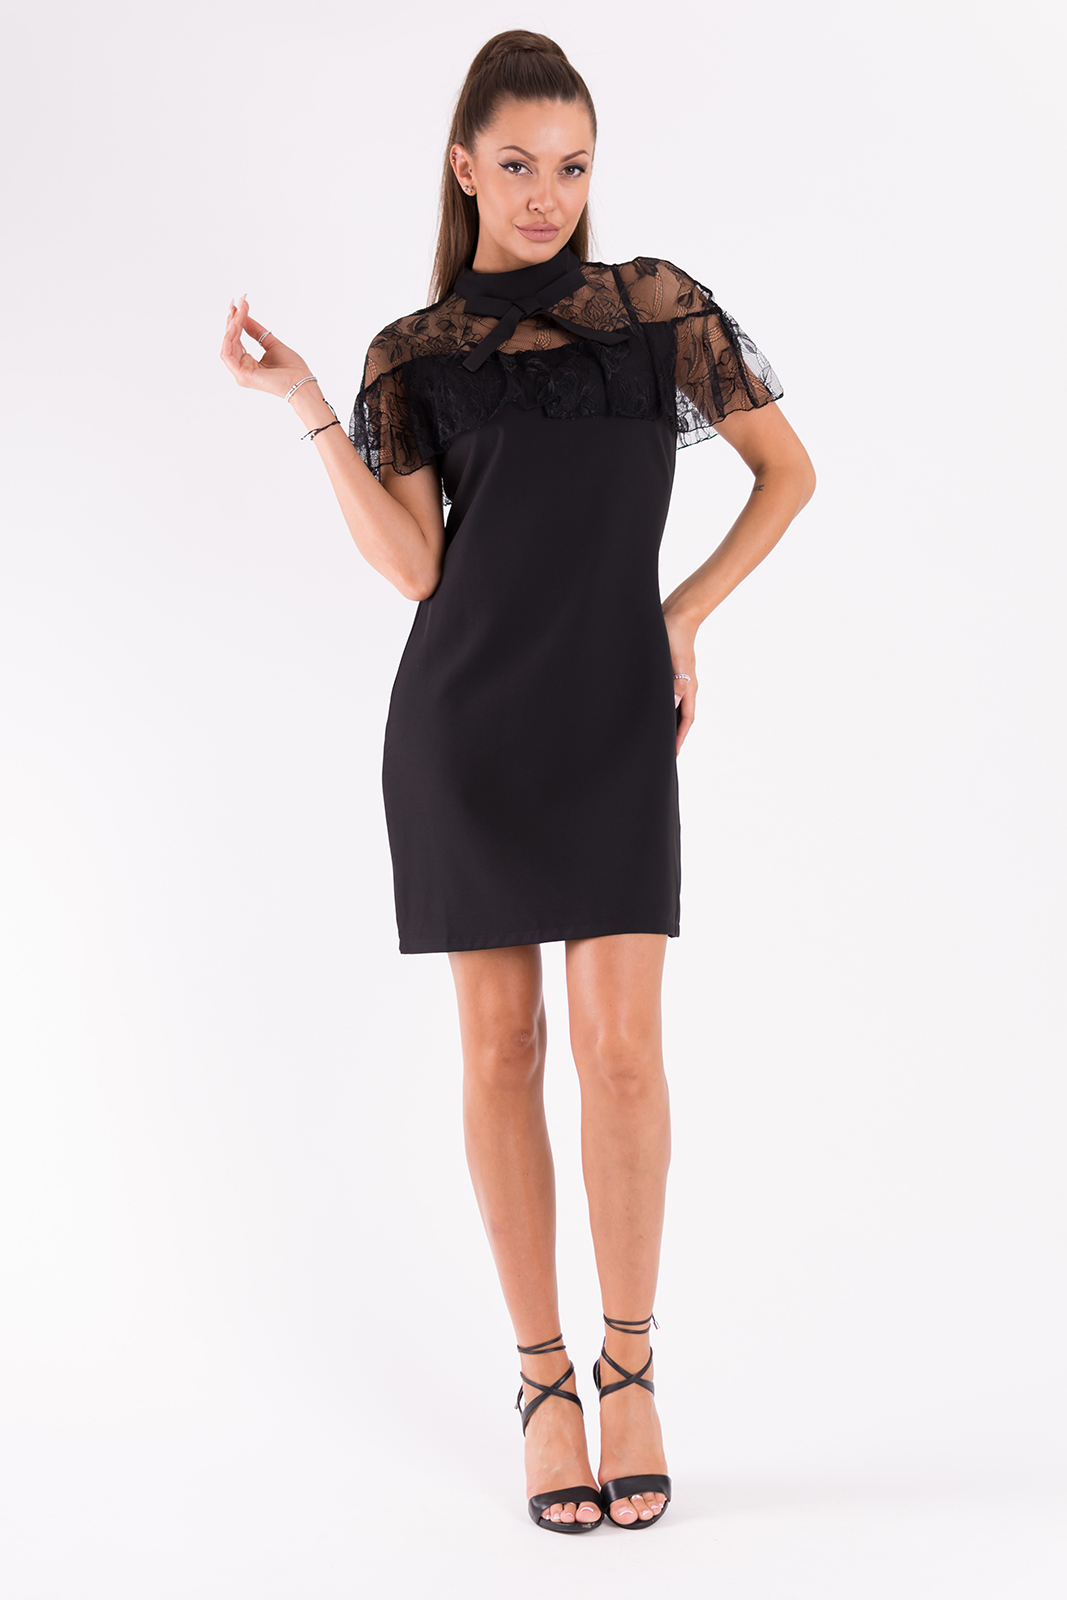 SOKY SOKA  DRESS BLACK 49007-1